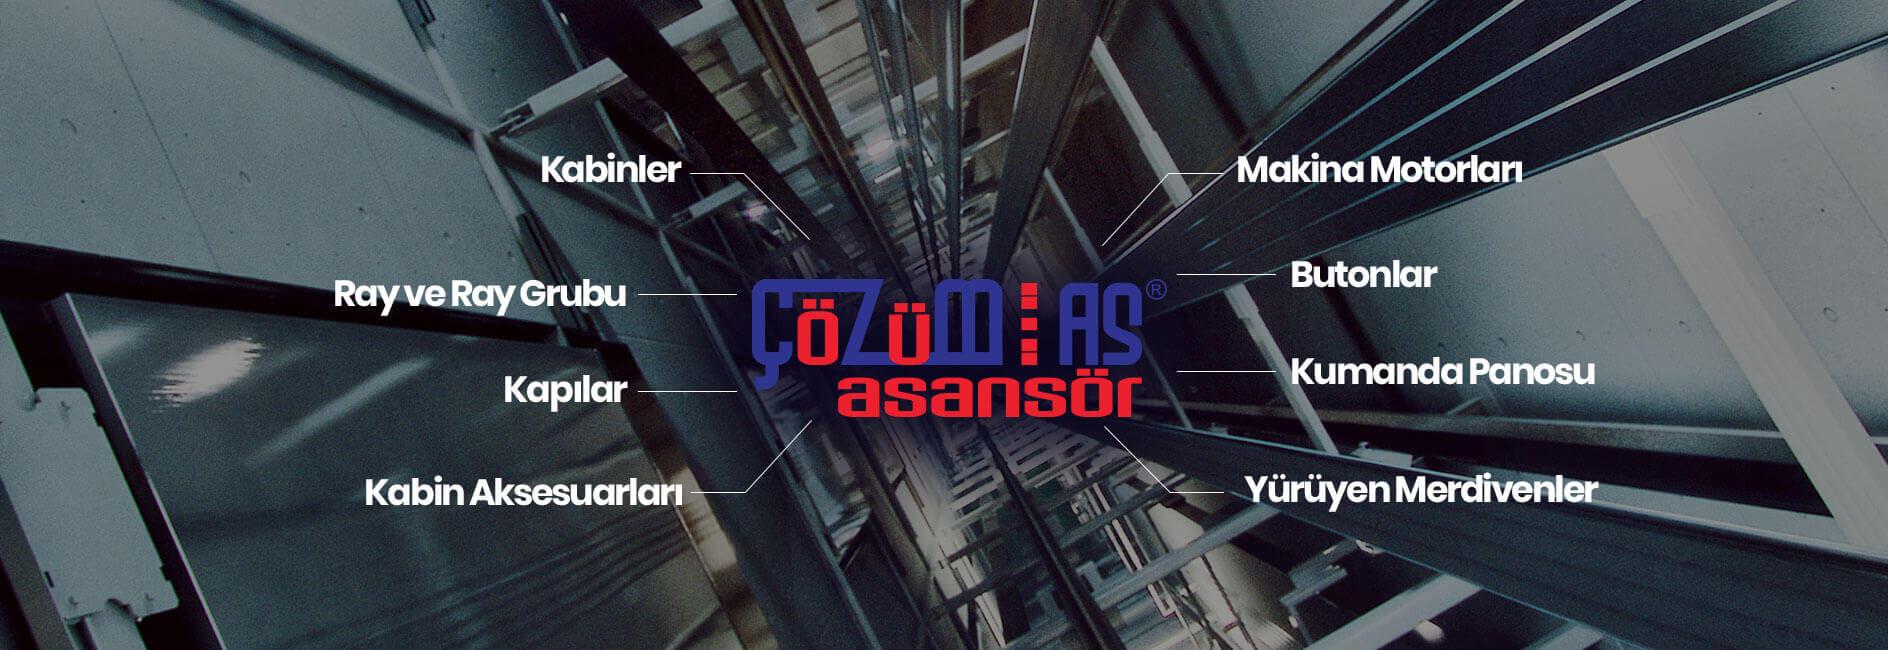 Ankara Asansör Firması - Çözüm Asansör